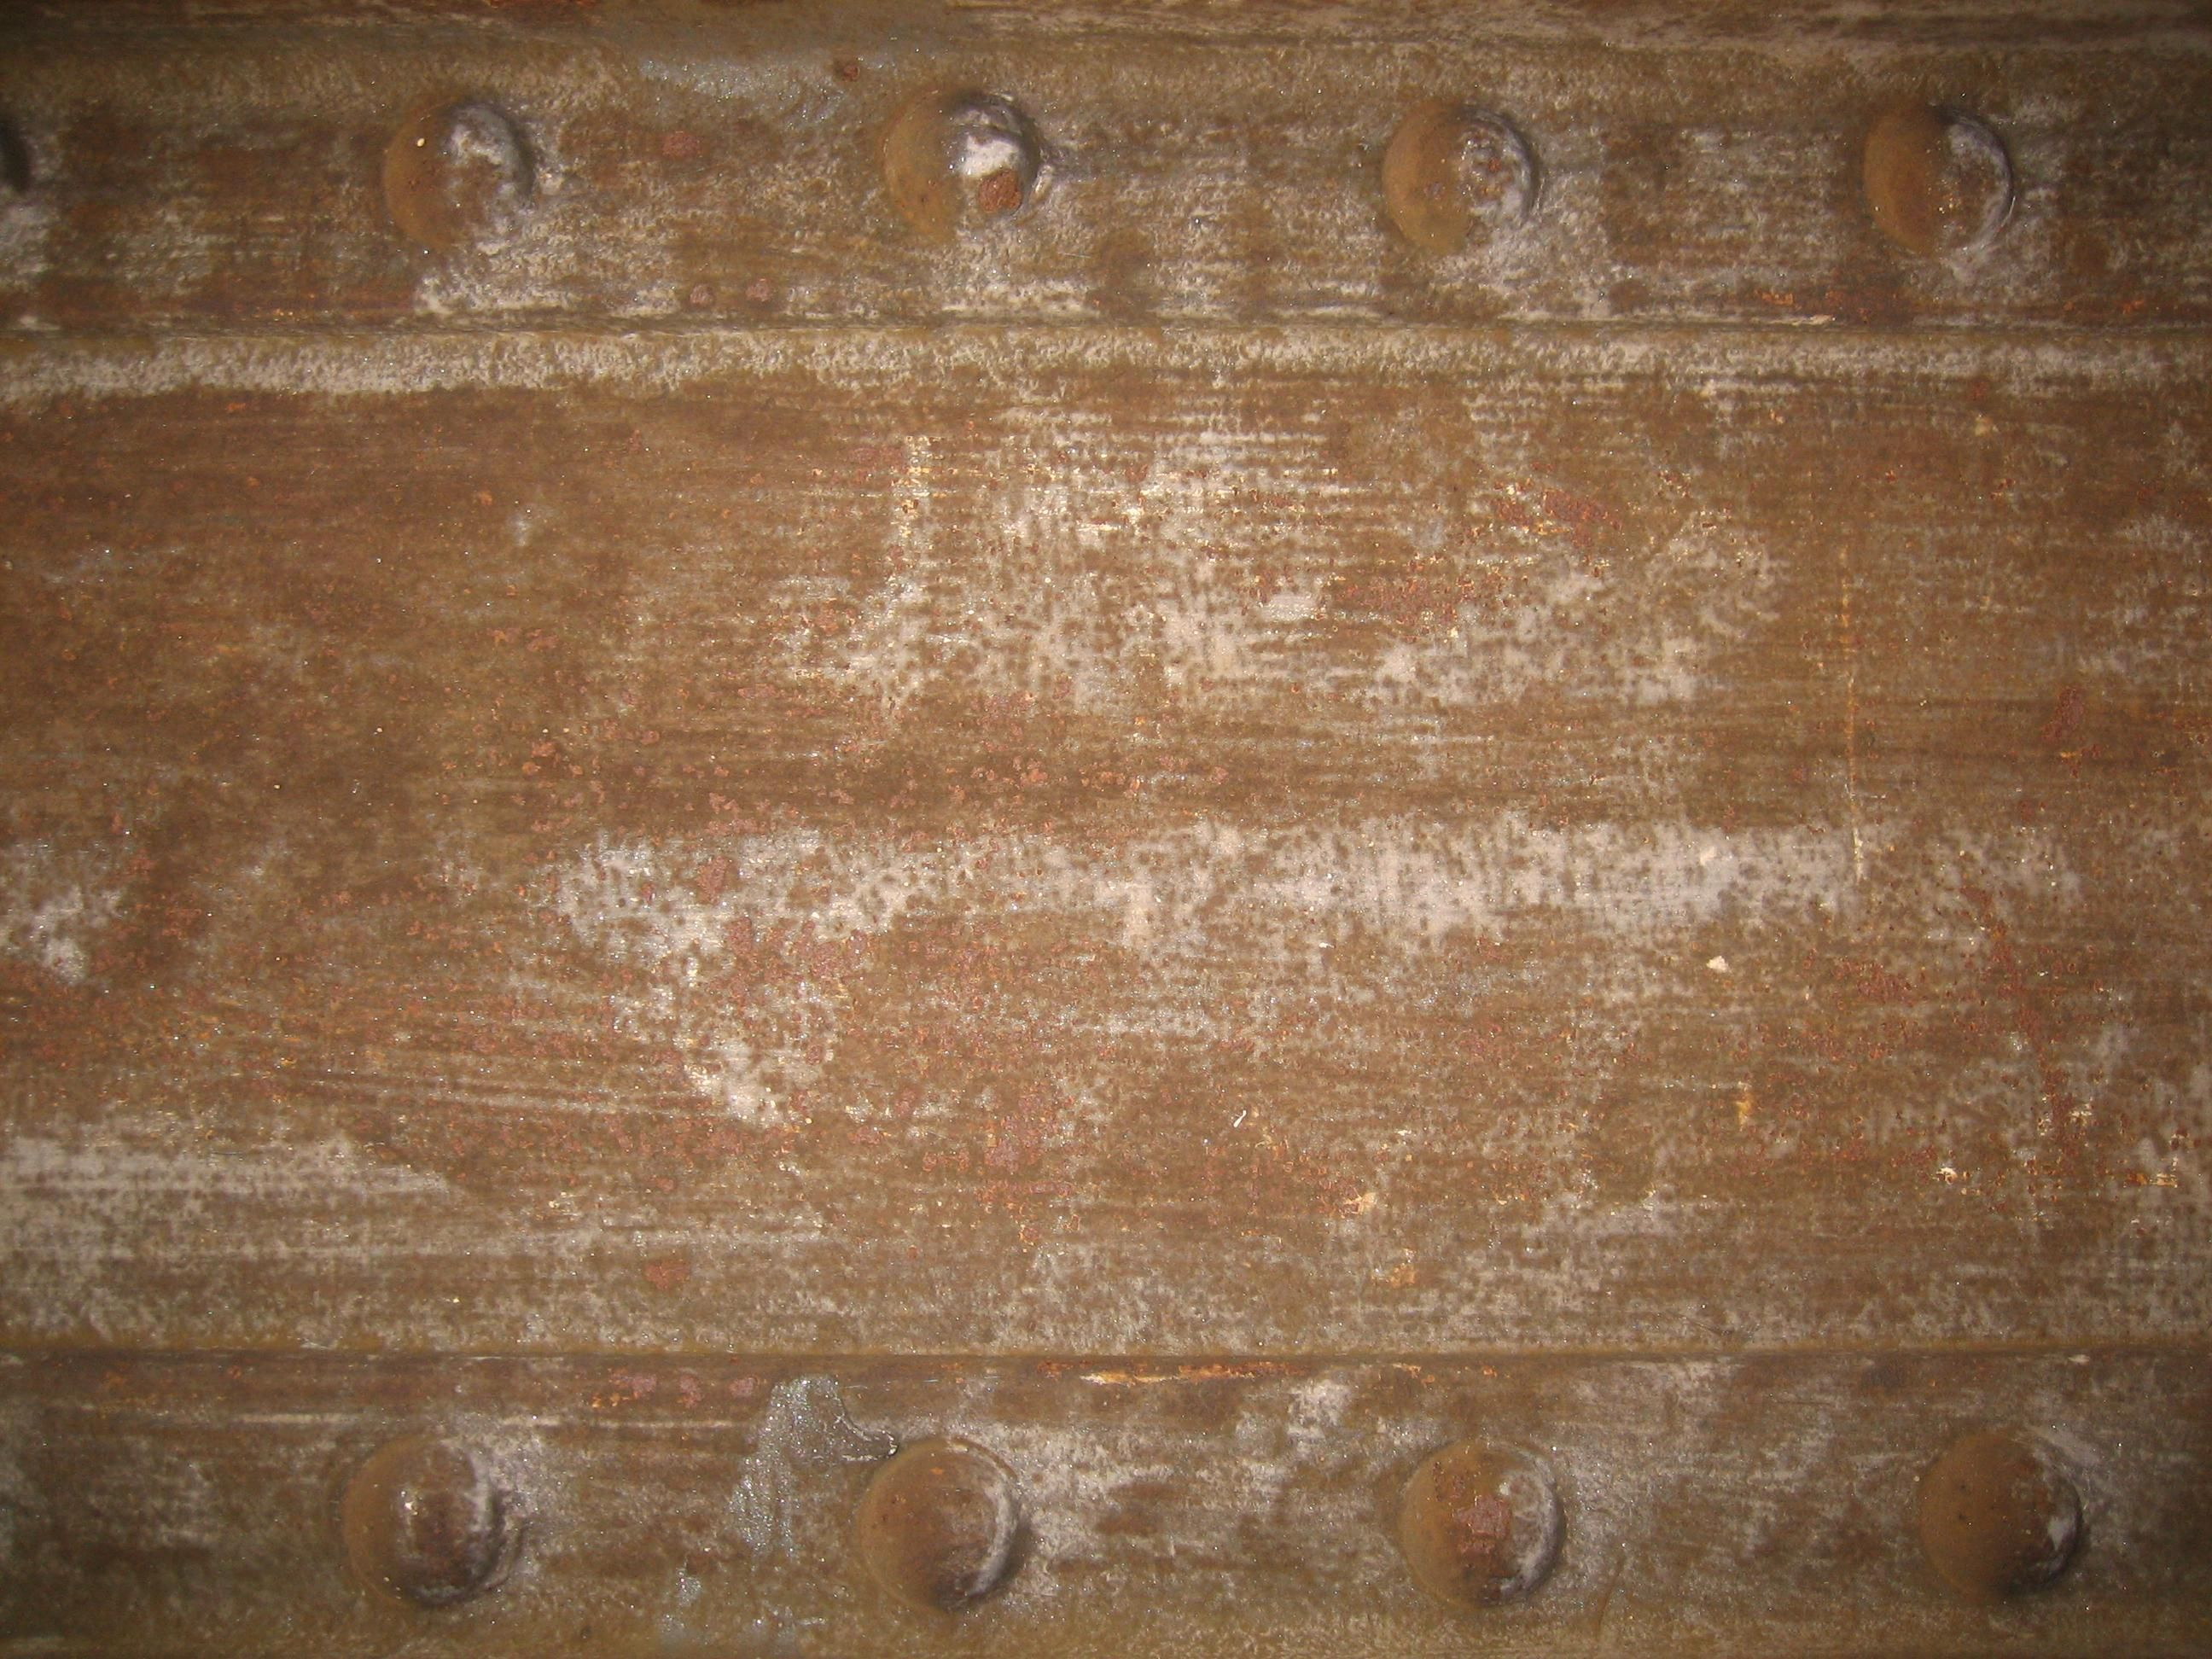 Rusty Iron Texture Kostenlose Bild: alt, ...